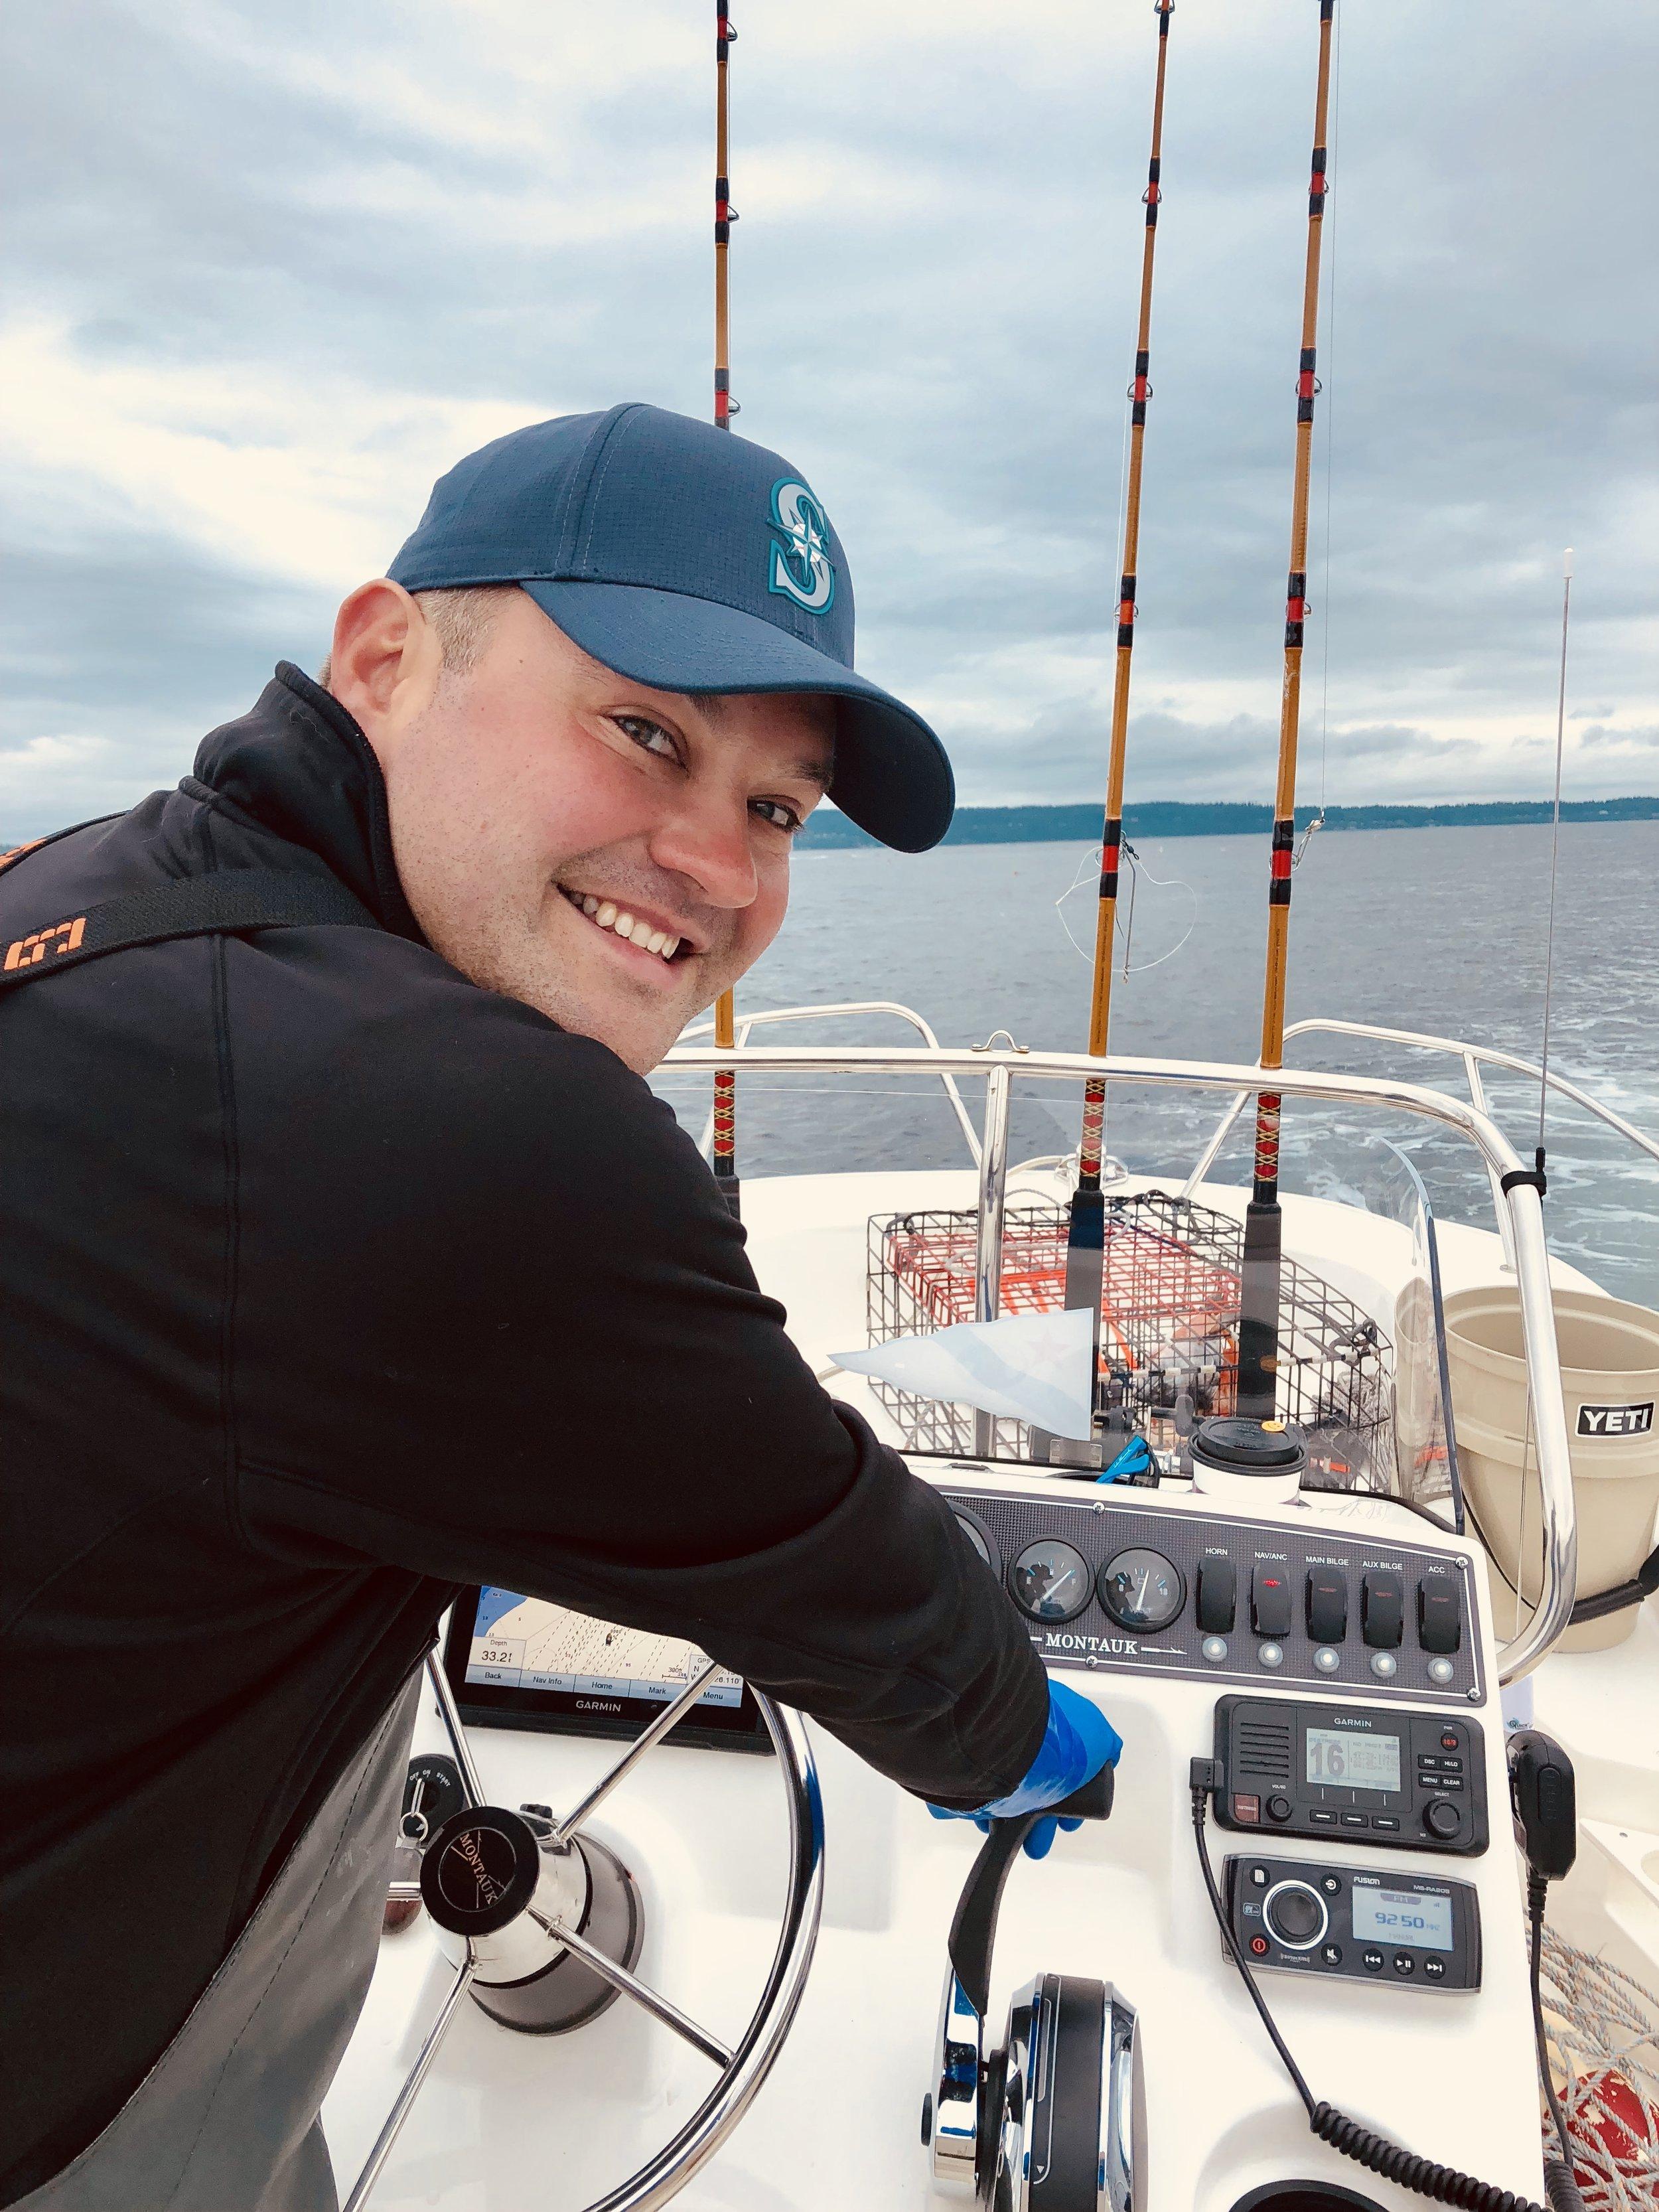 First day of crabbing season 2018. -